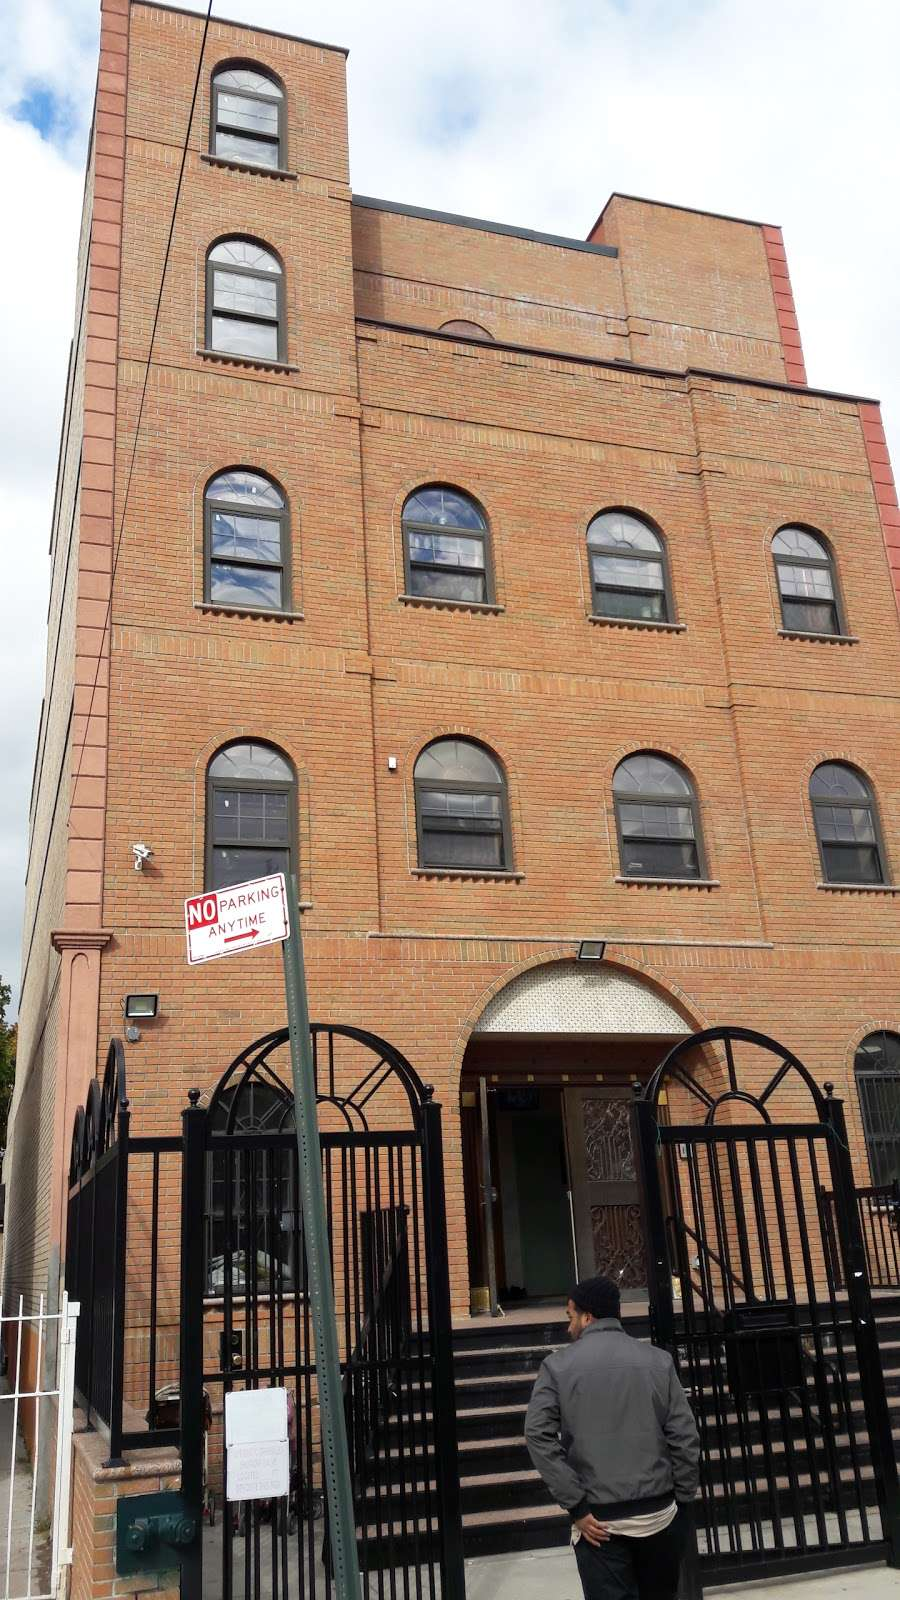 Baitul Mamur Masjid & Community Center - mosque  | Photo 3 of 10 | Address: 1033 Glenmore Ave, Brooklyn, NY 11208, USA | Phone: (718) 437-5702